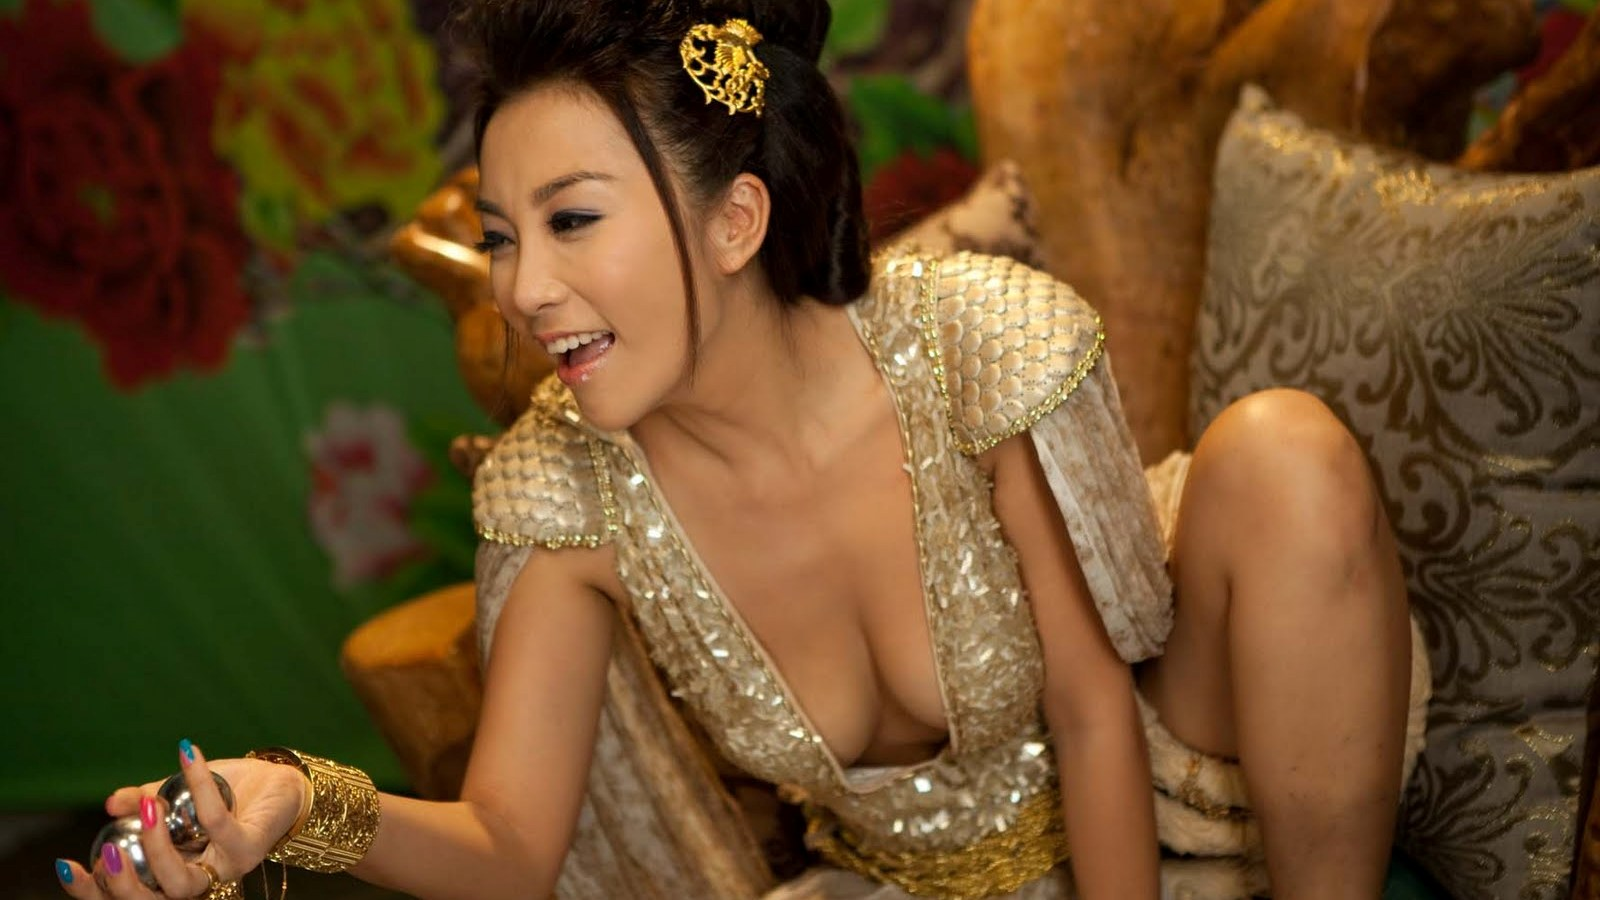 china-sexy-movies-hood-booty-redbones